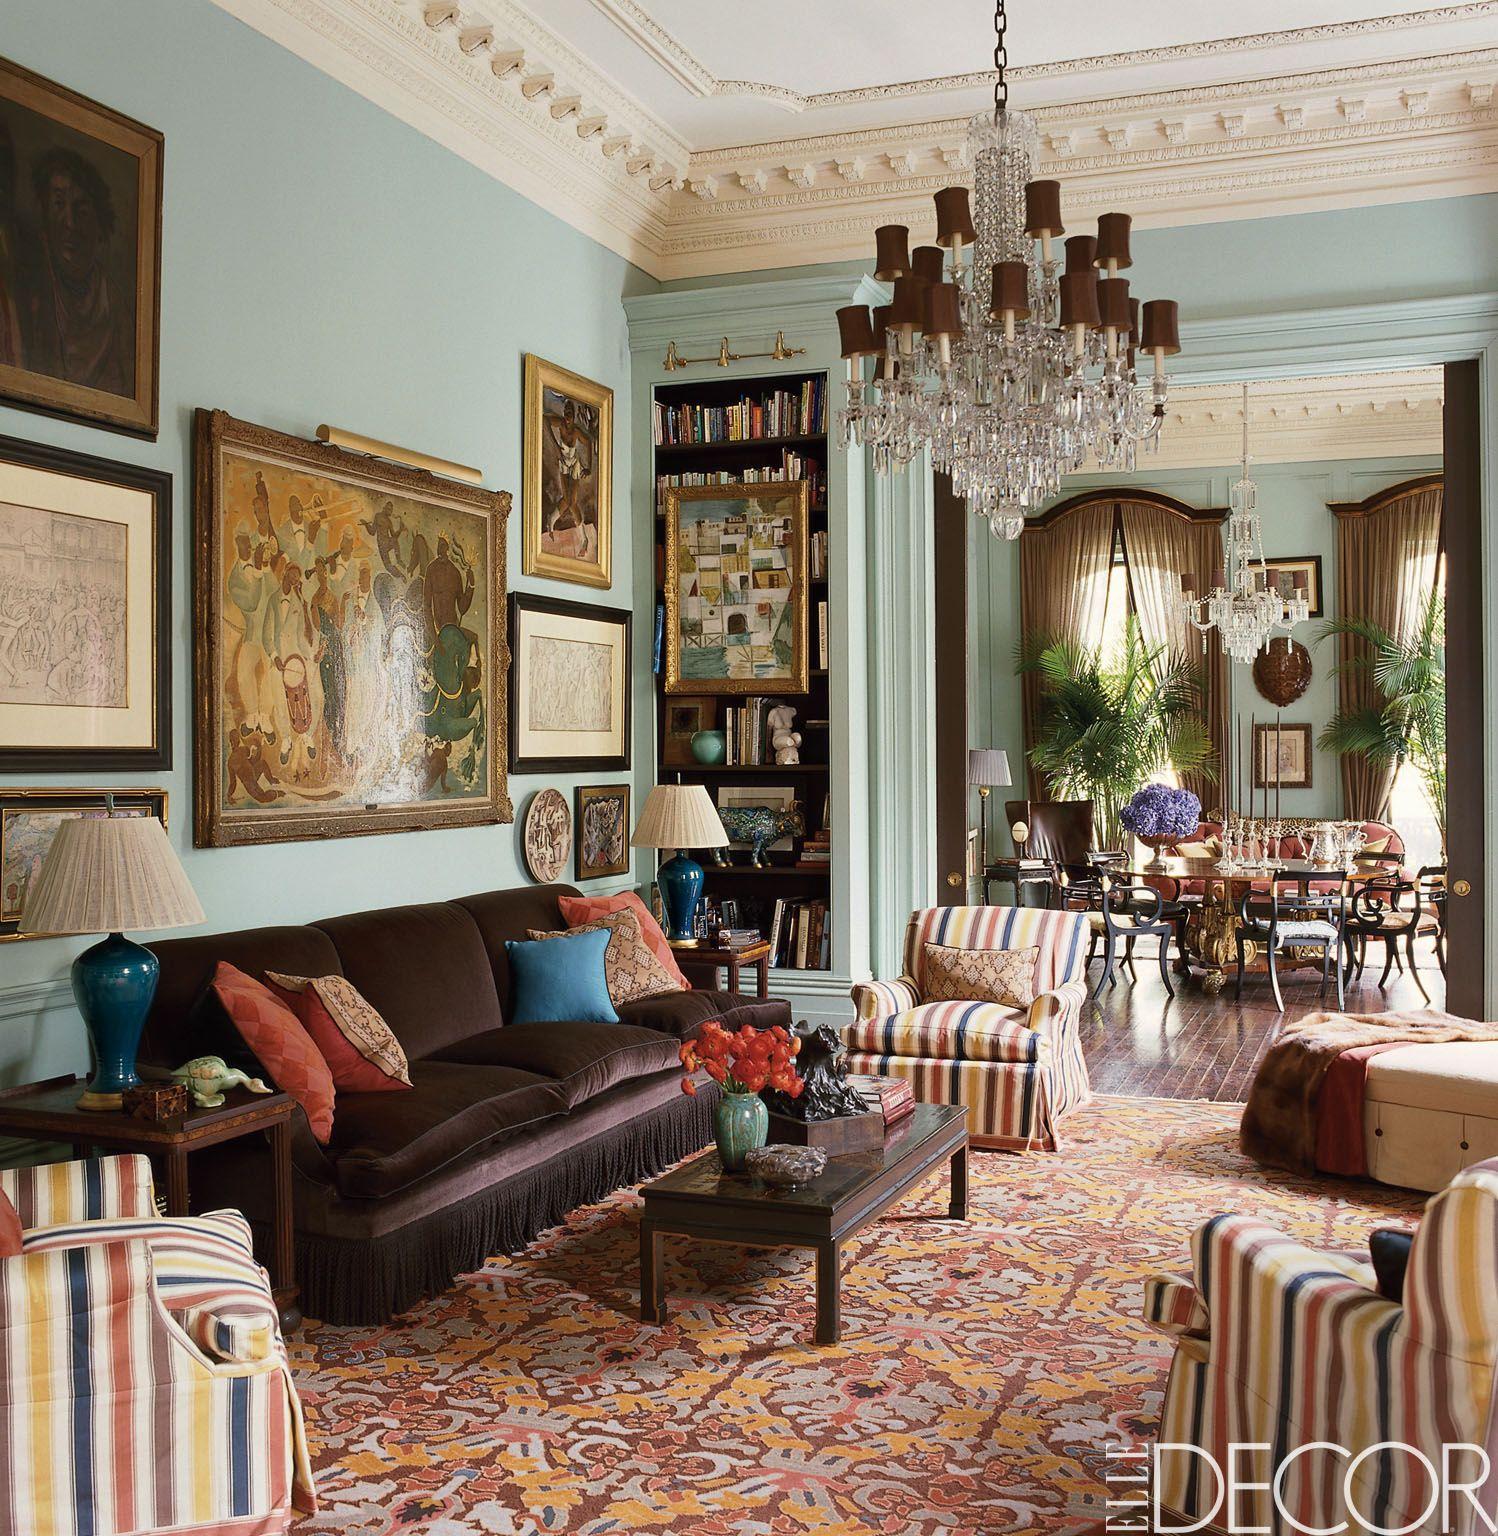 The 2019 A List 100 Of Elle Decor S Favorite Interior Designers Interior Design Elle Decor Home